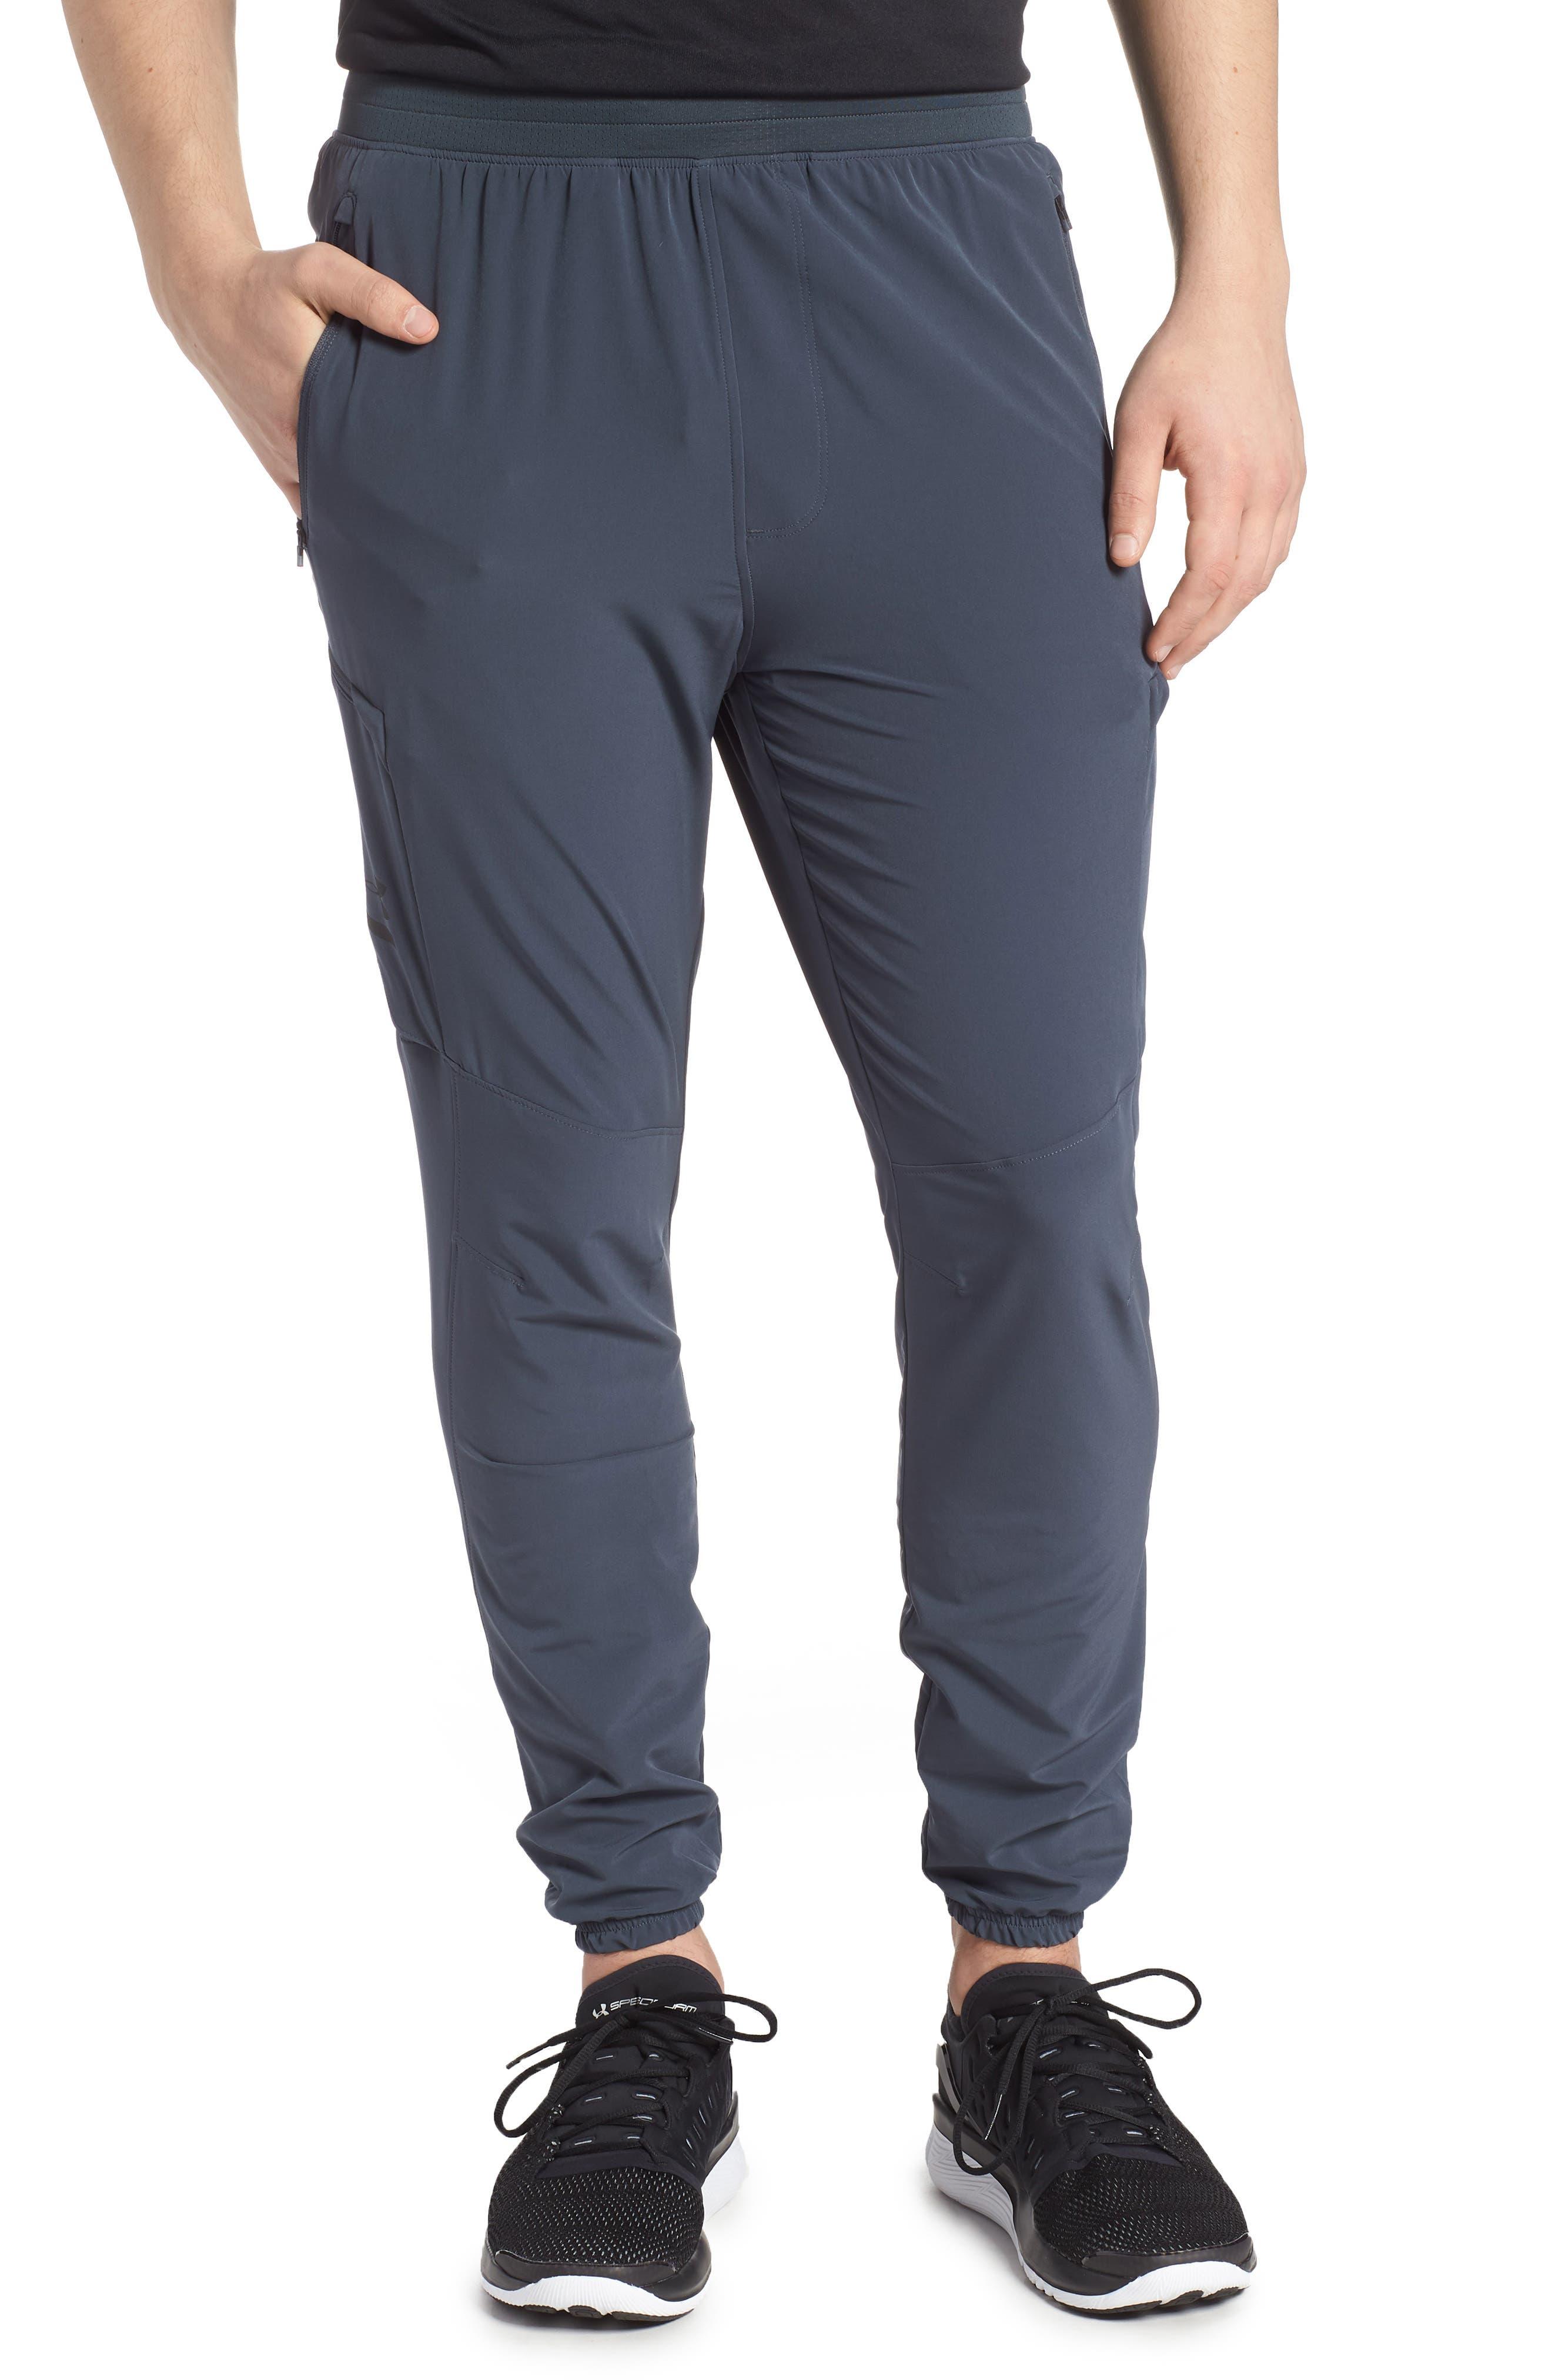 Perpetual Cargo Jogger Pants,                         Main,                         color, STEALTH GRAY/ BLACK